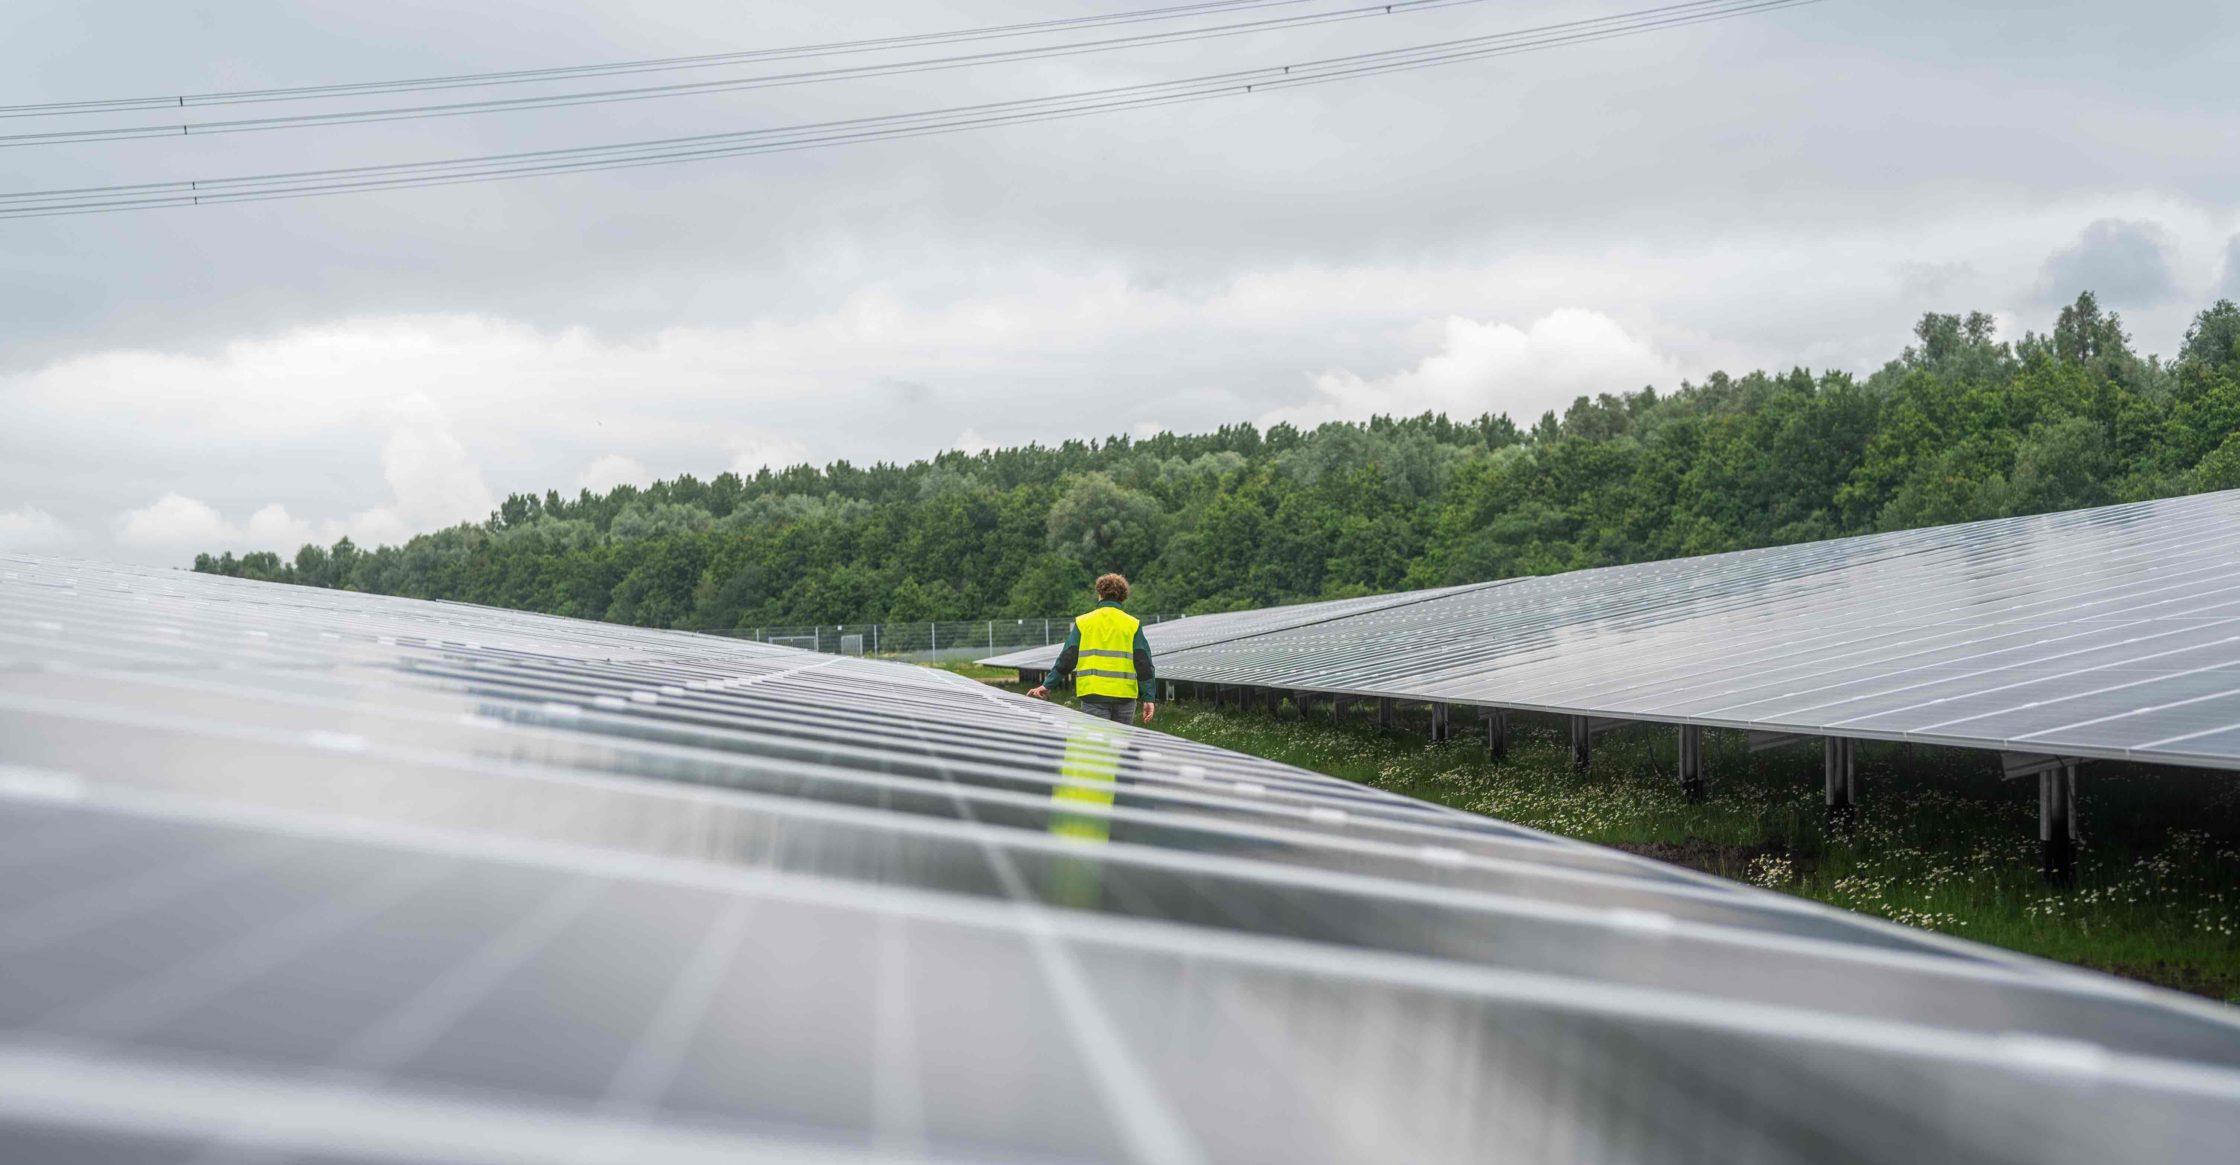 Inspectie zonnepanelen Roosendaal evertkreekweg header 2